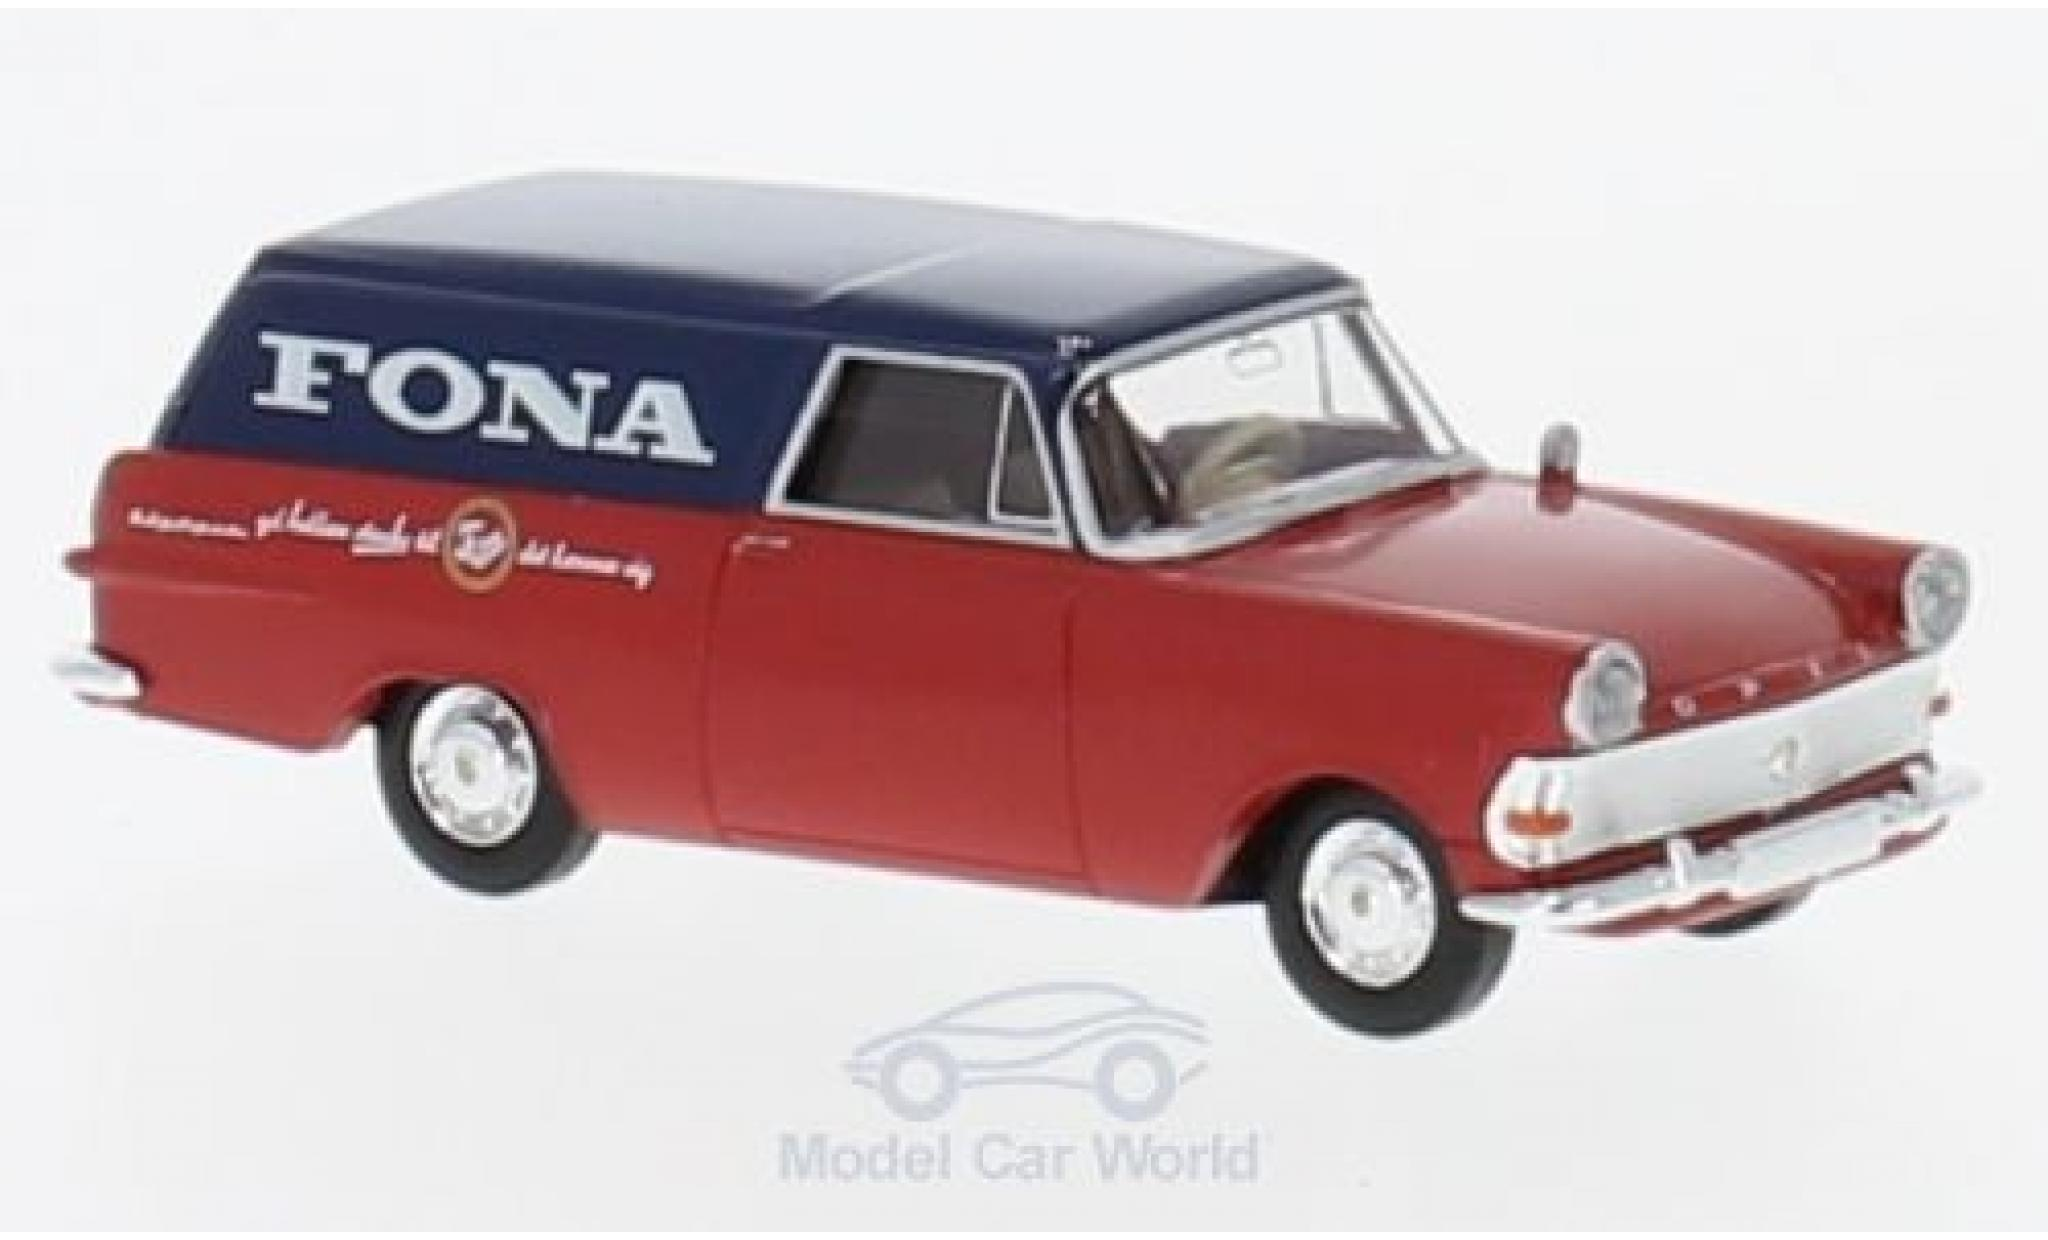 Opel Rekord 1/87 Brekina P2 Kasten Fona (DK)